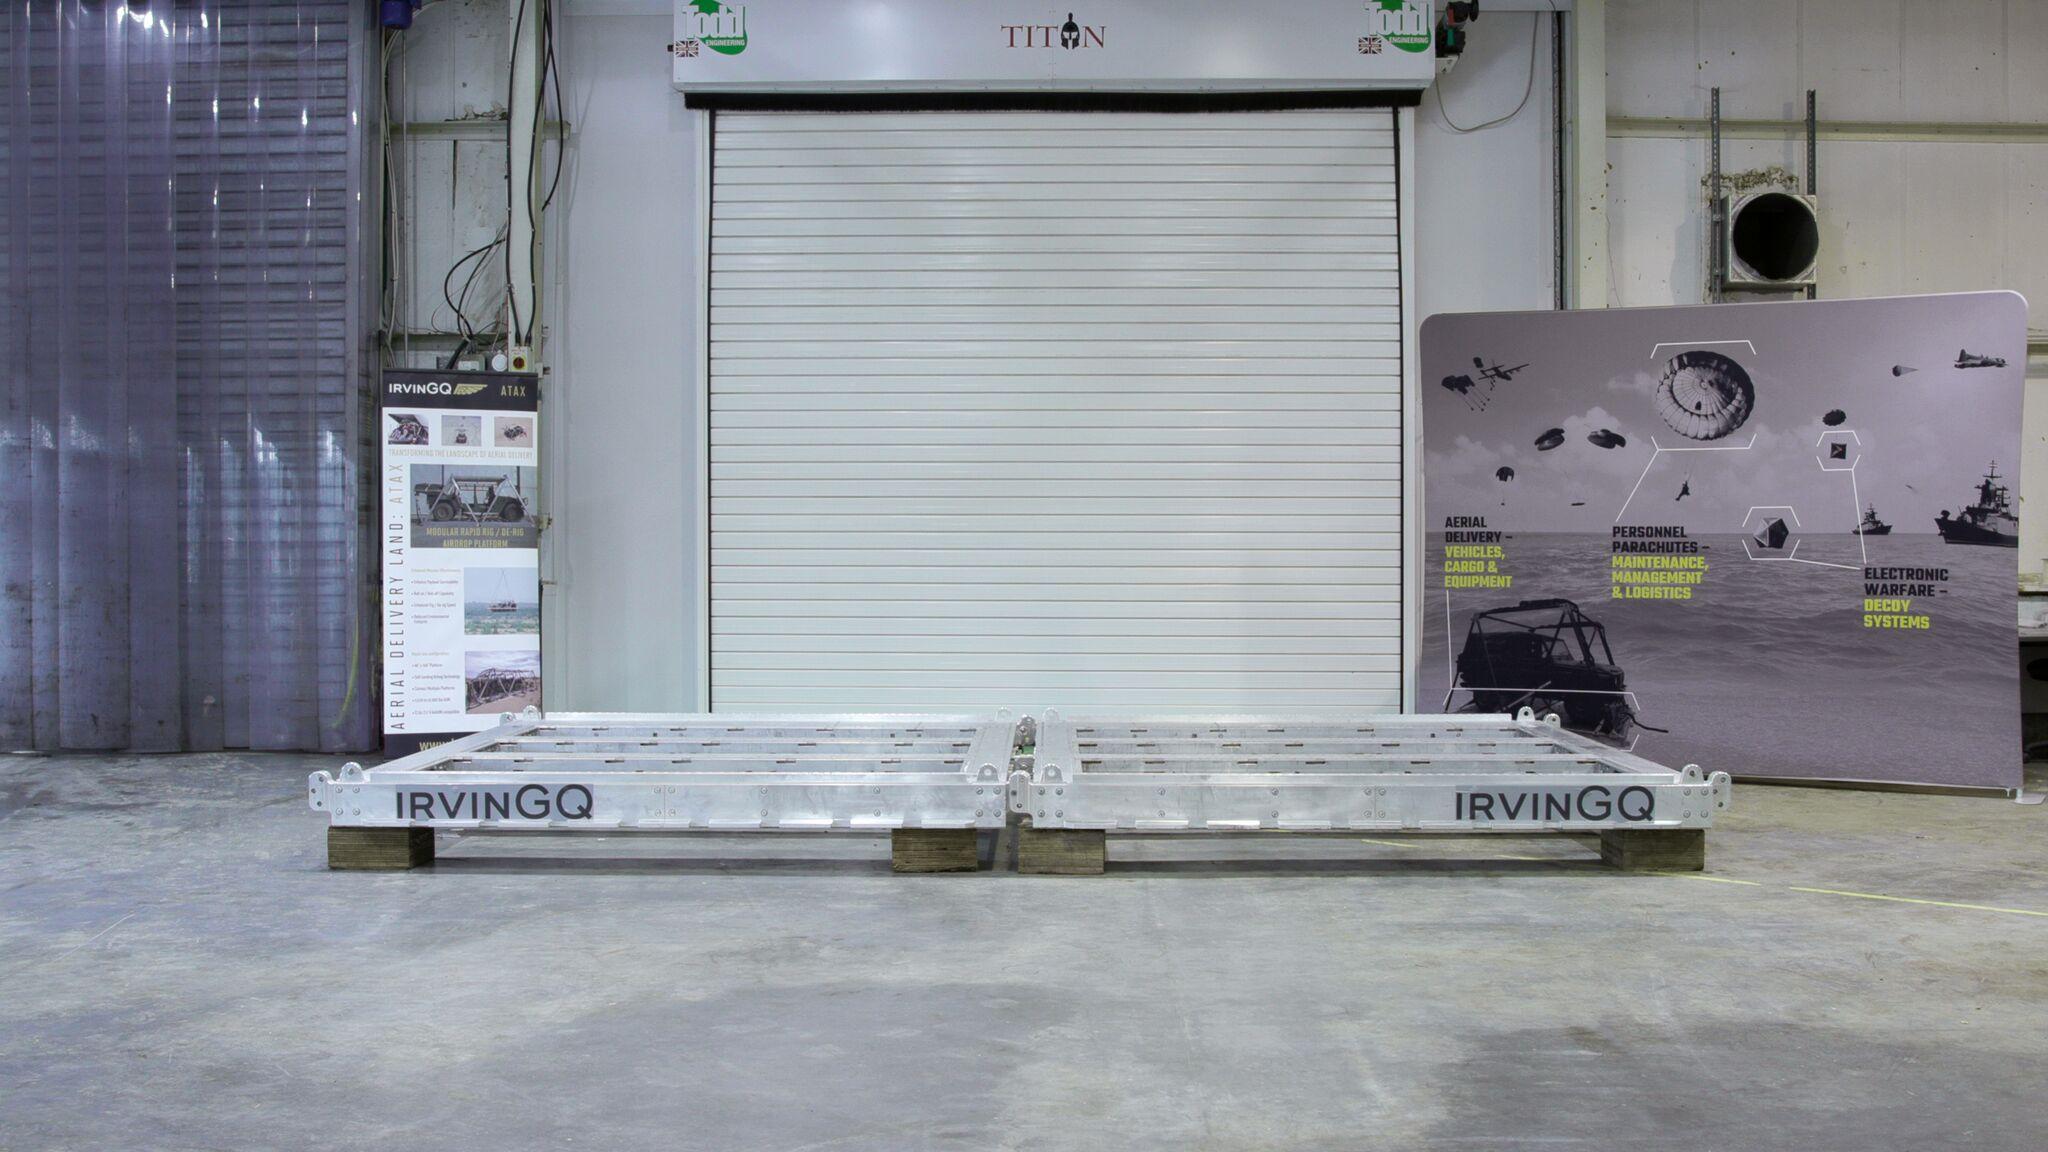 IrvinGQ ATAX aerial delivery modular platform